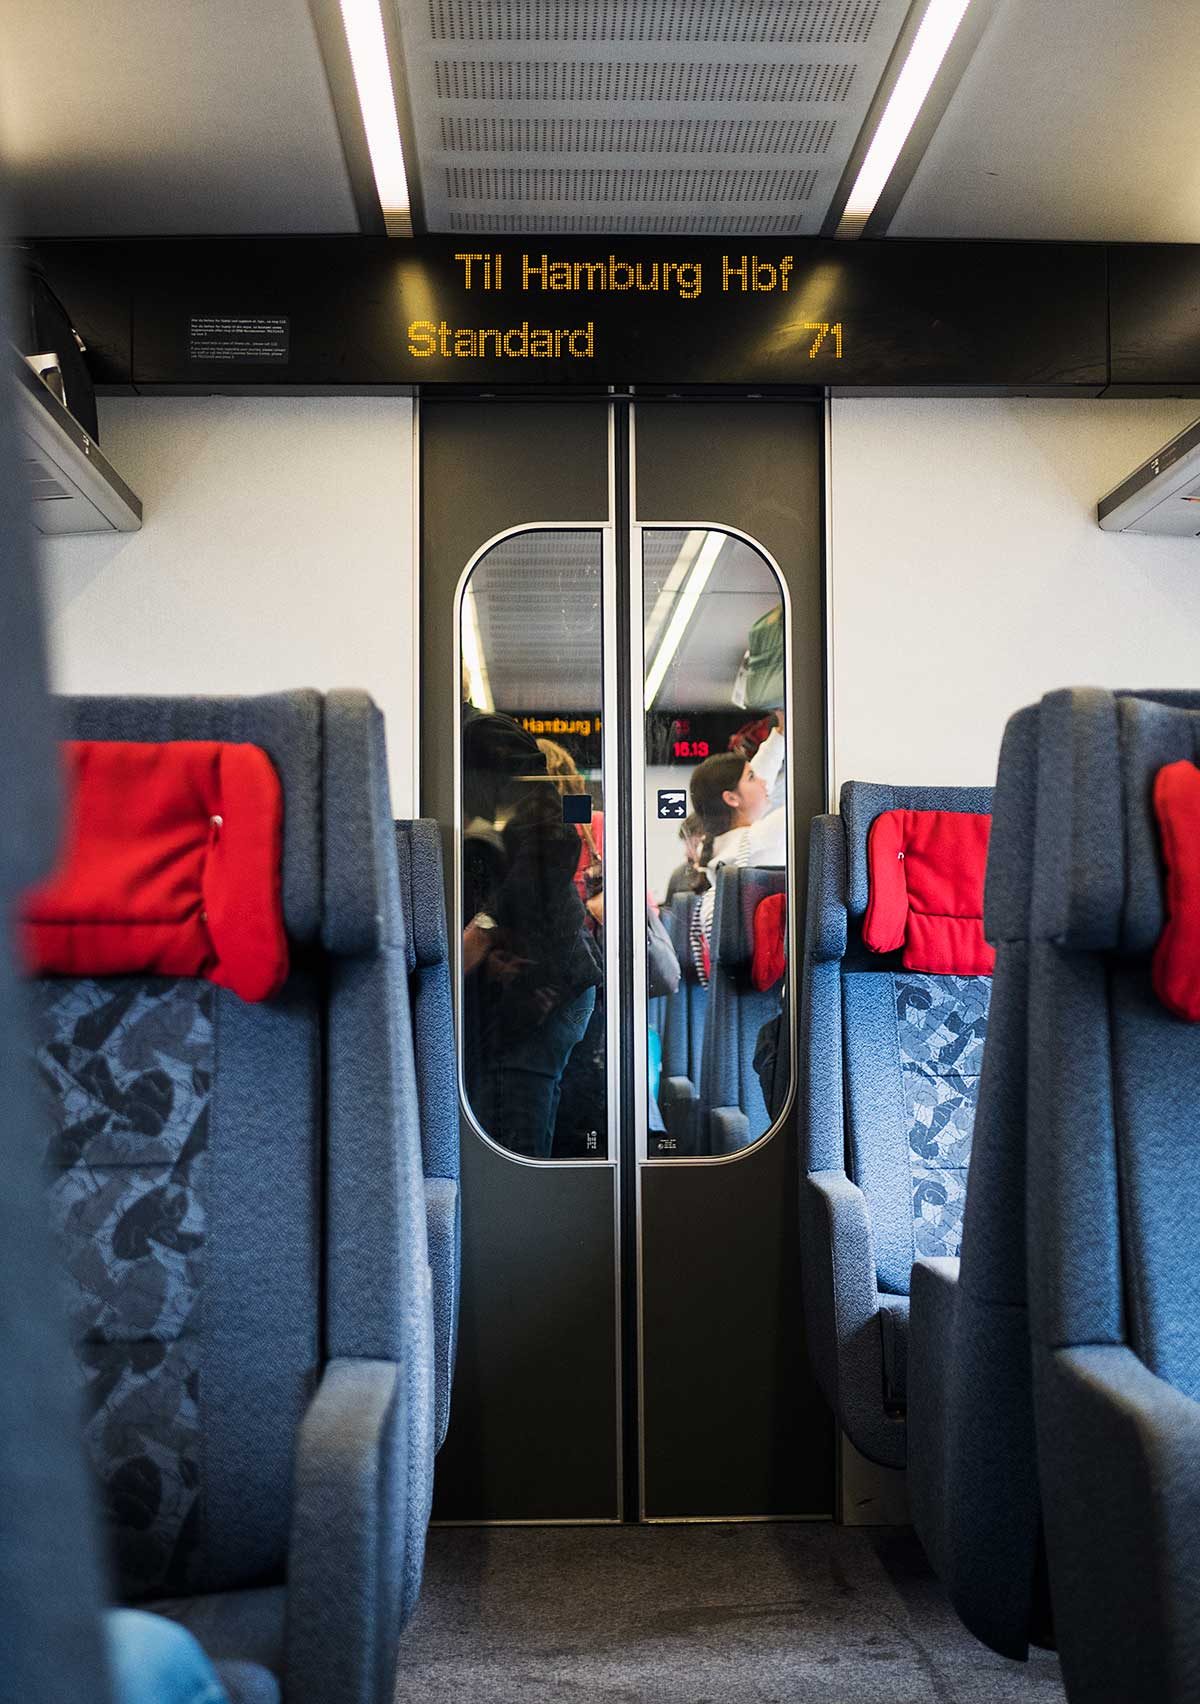 Guide: Interrail i Europa | Frk. Kræsen